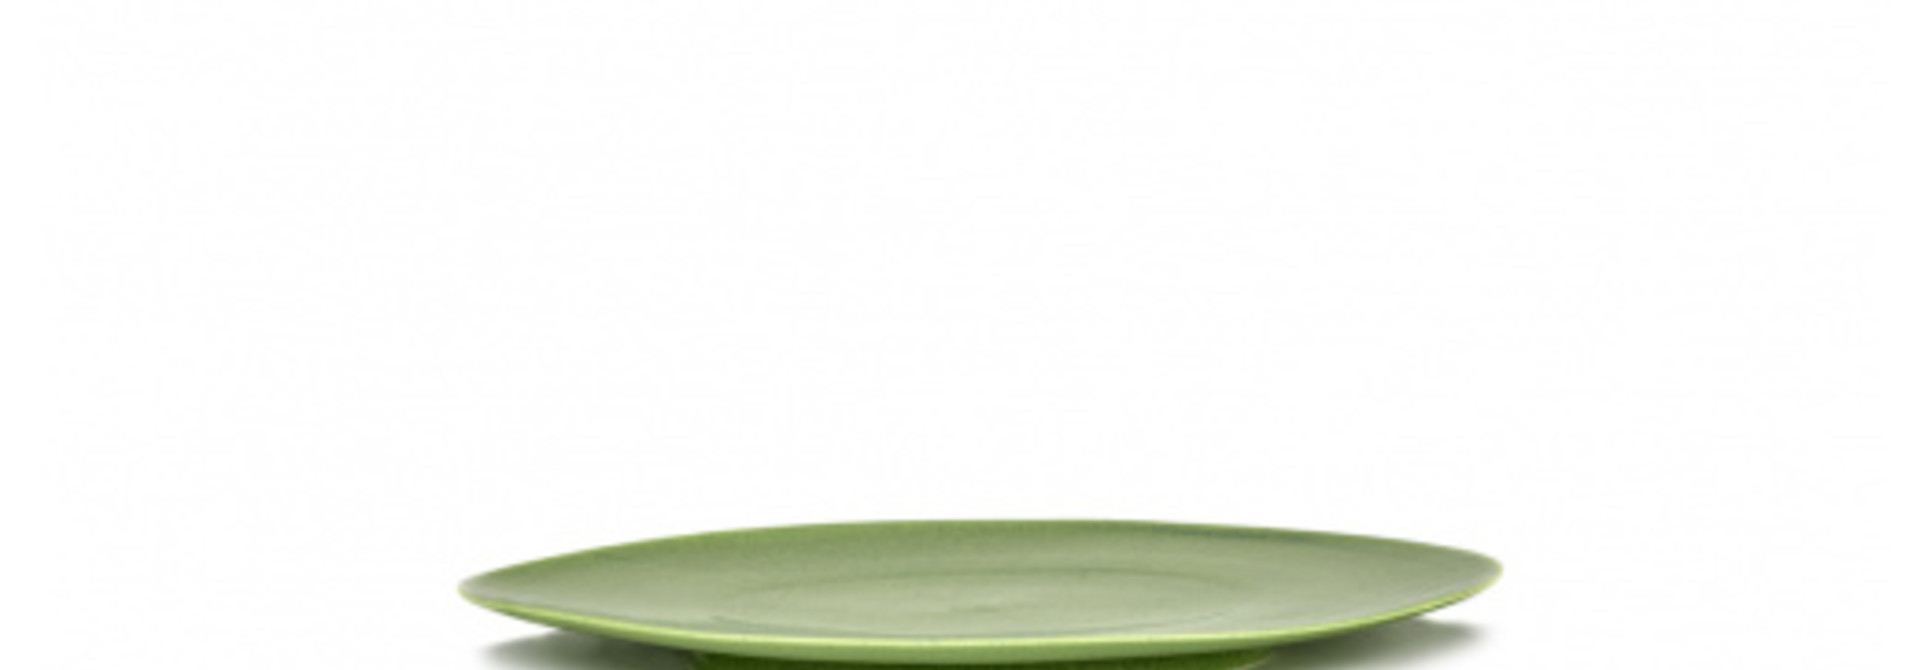 Plate - Green - Medium